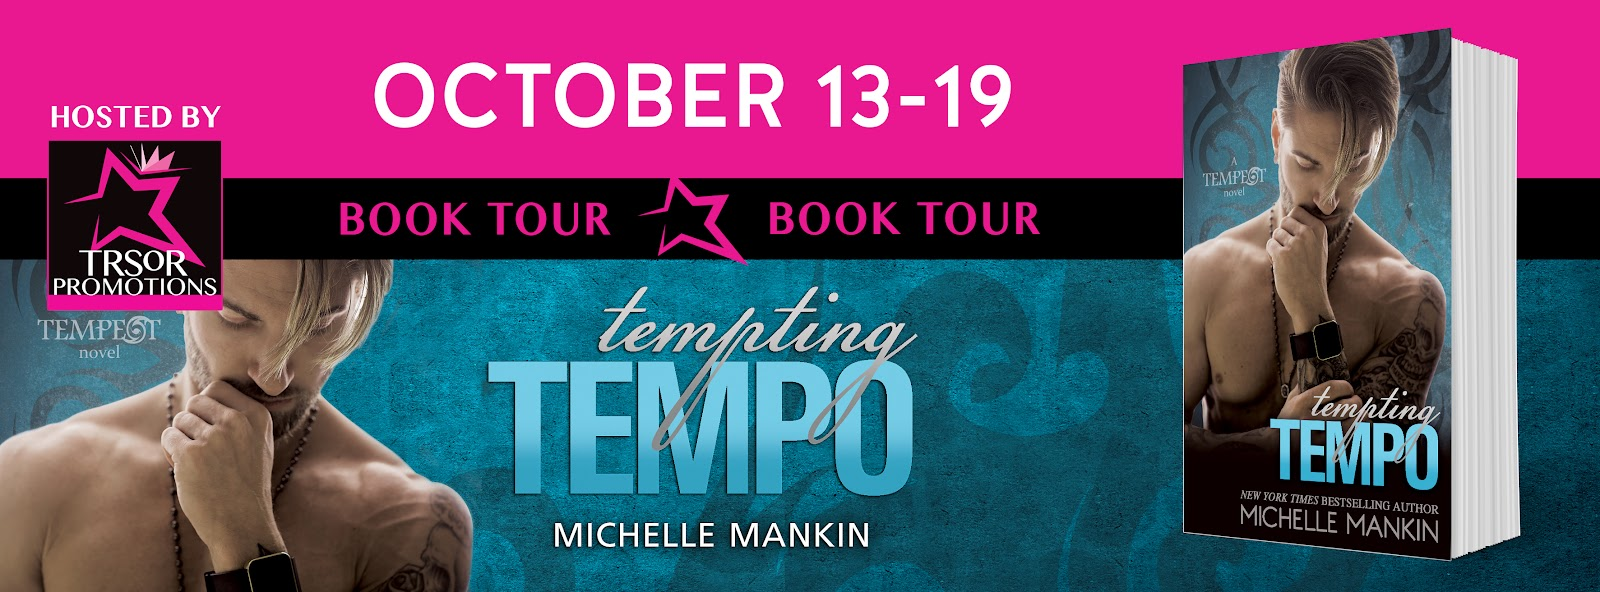 TEMPTING_TEMPO_BOOK_TOUR.jpg